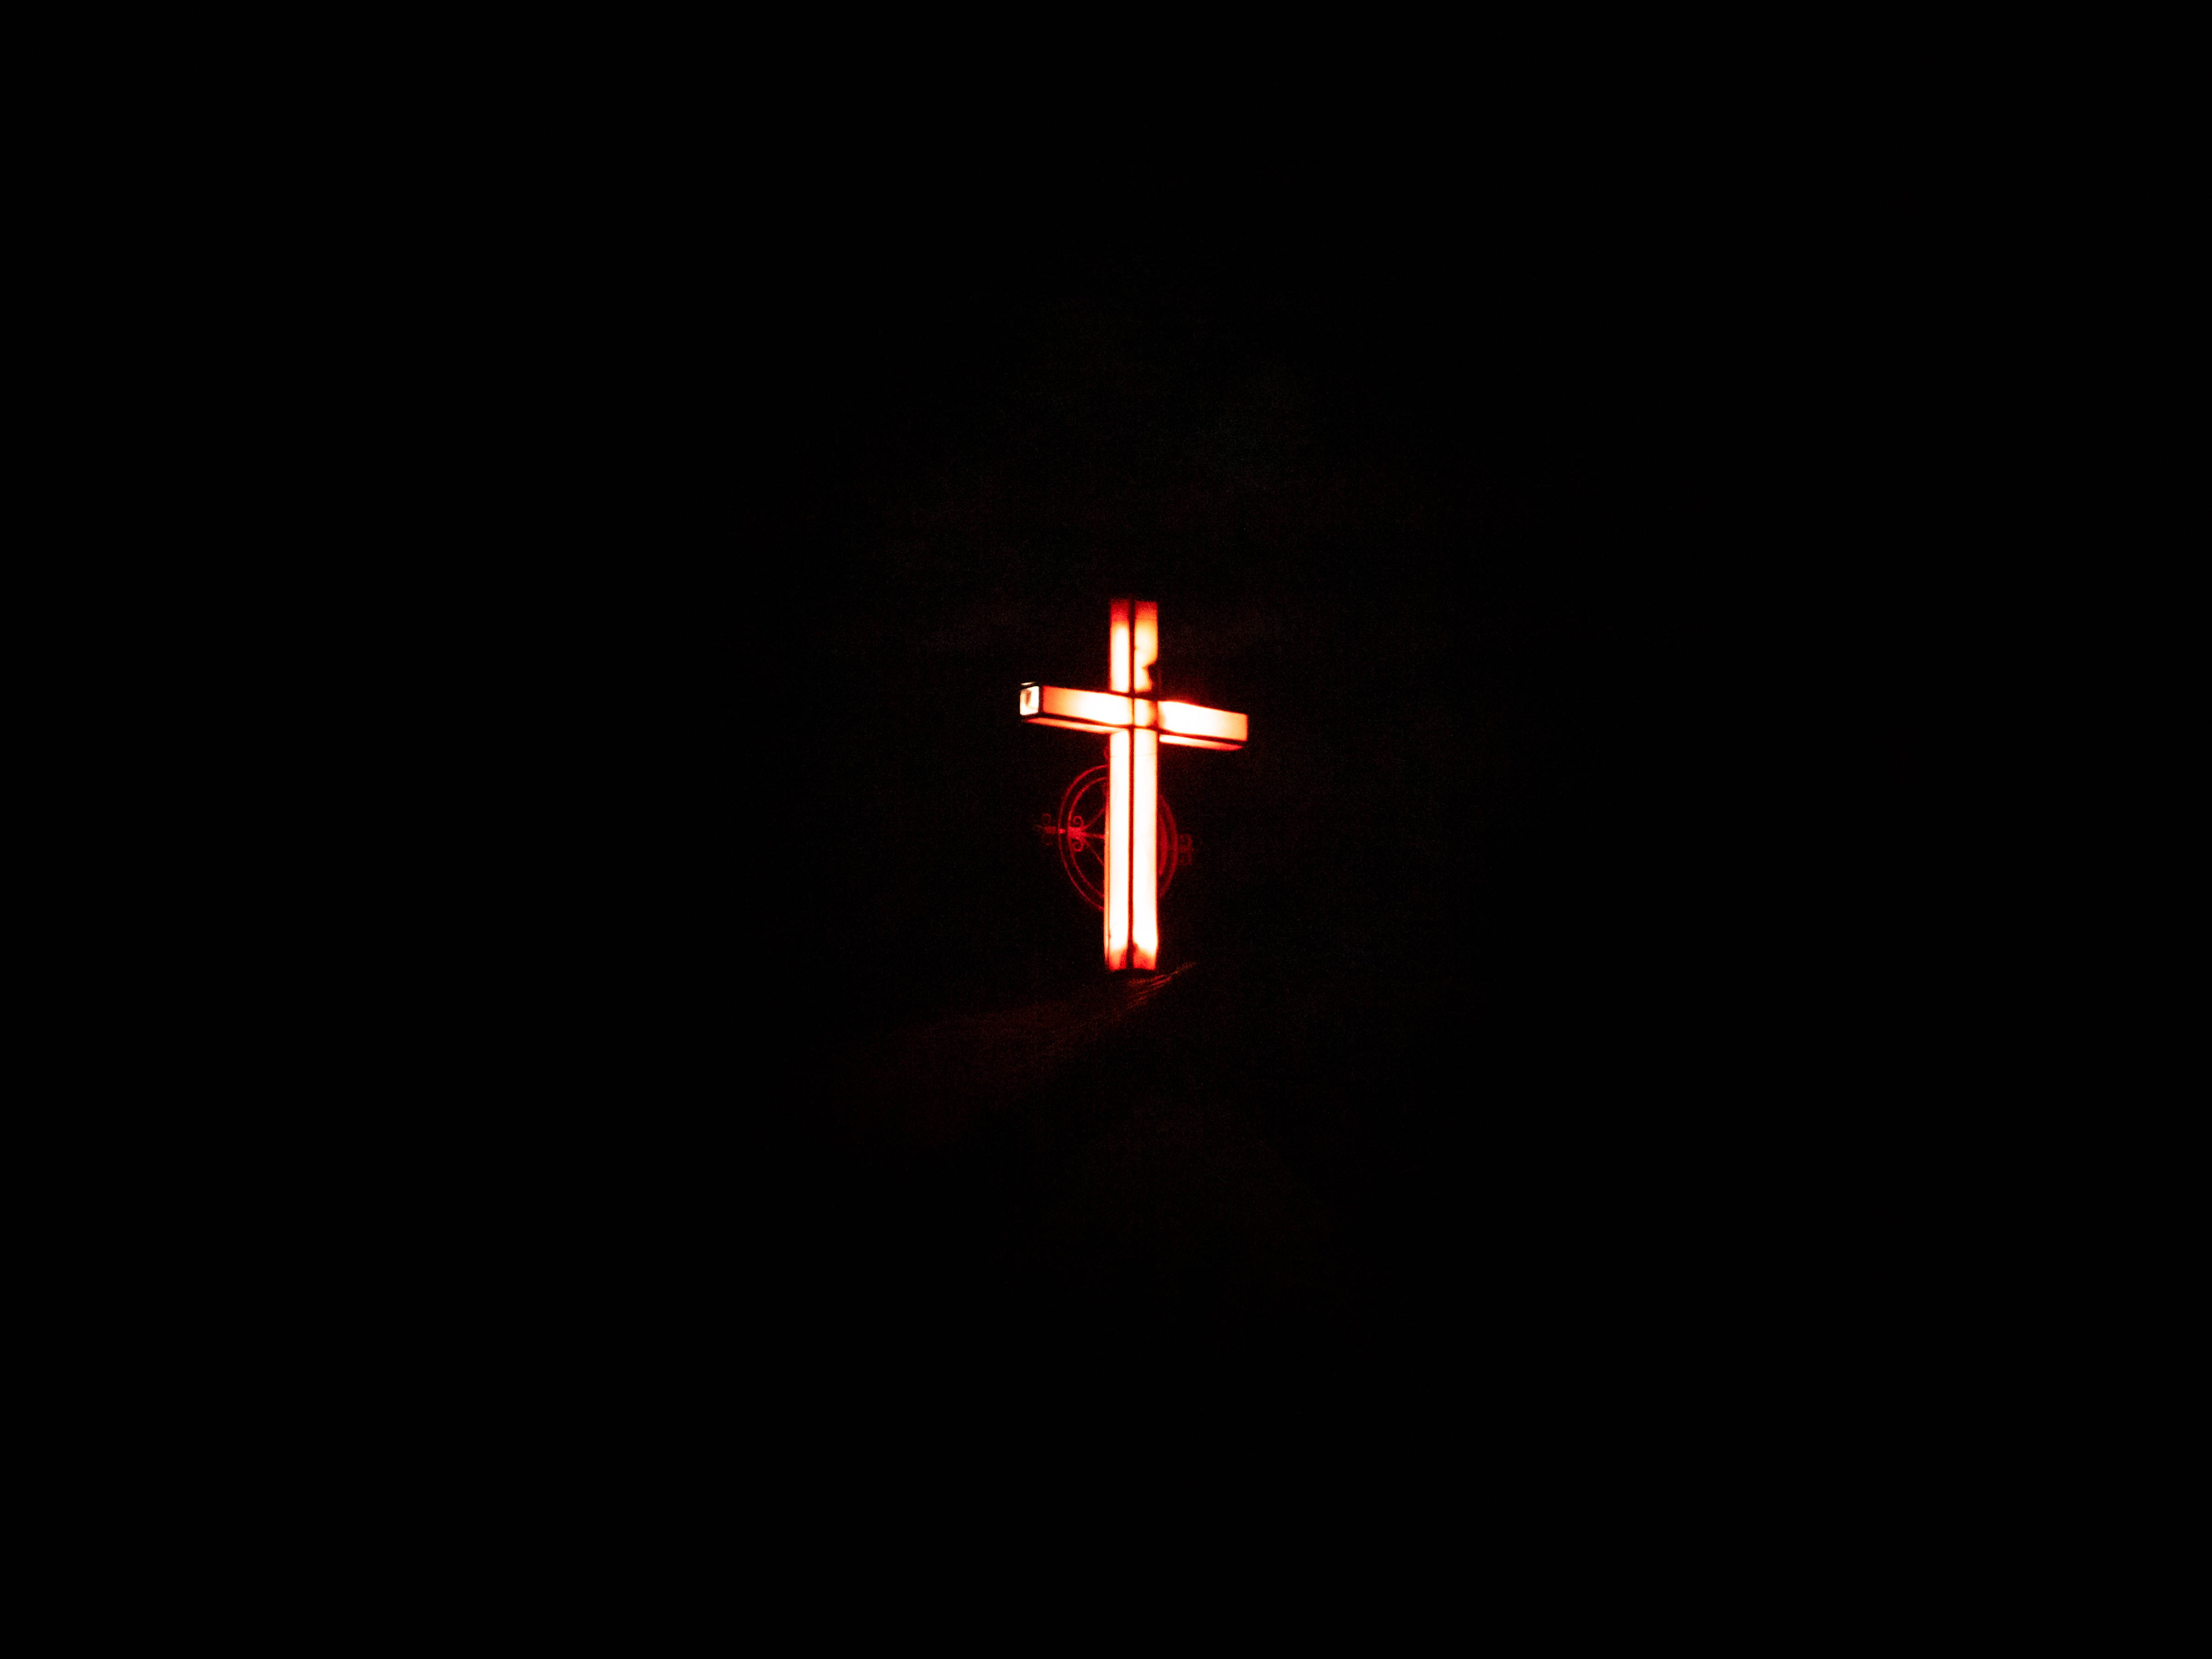 Pakistani Christian population declines